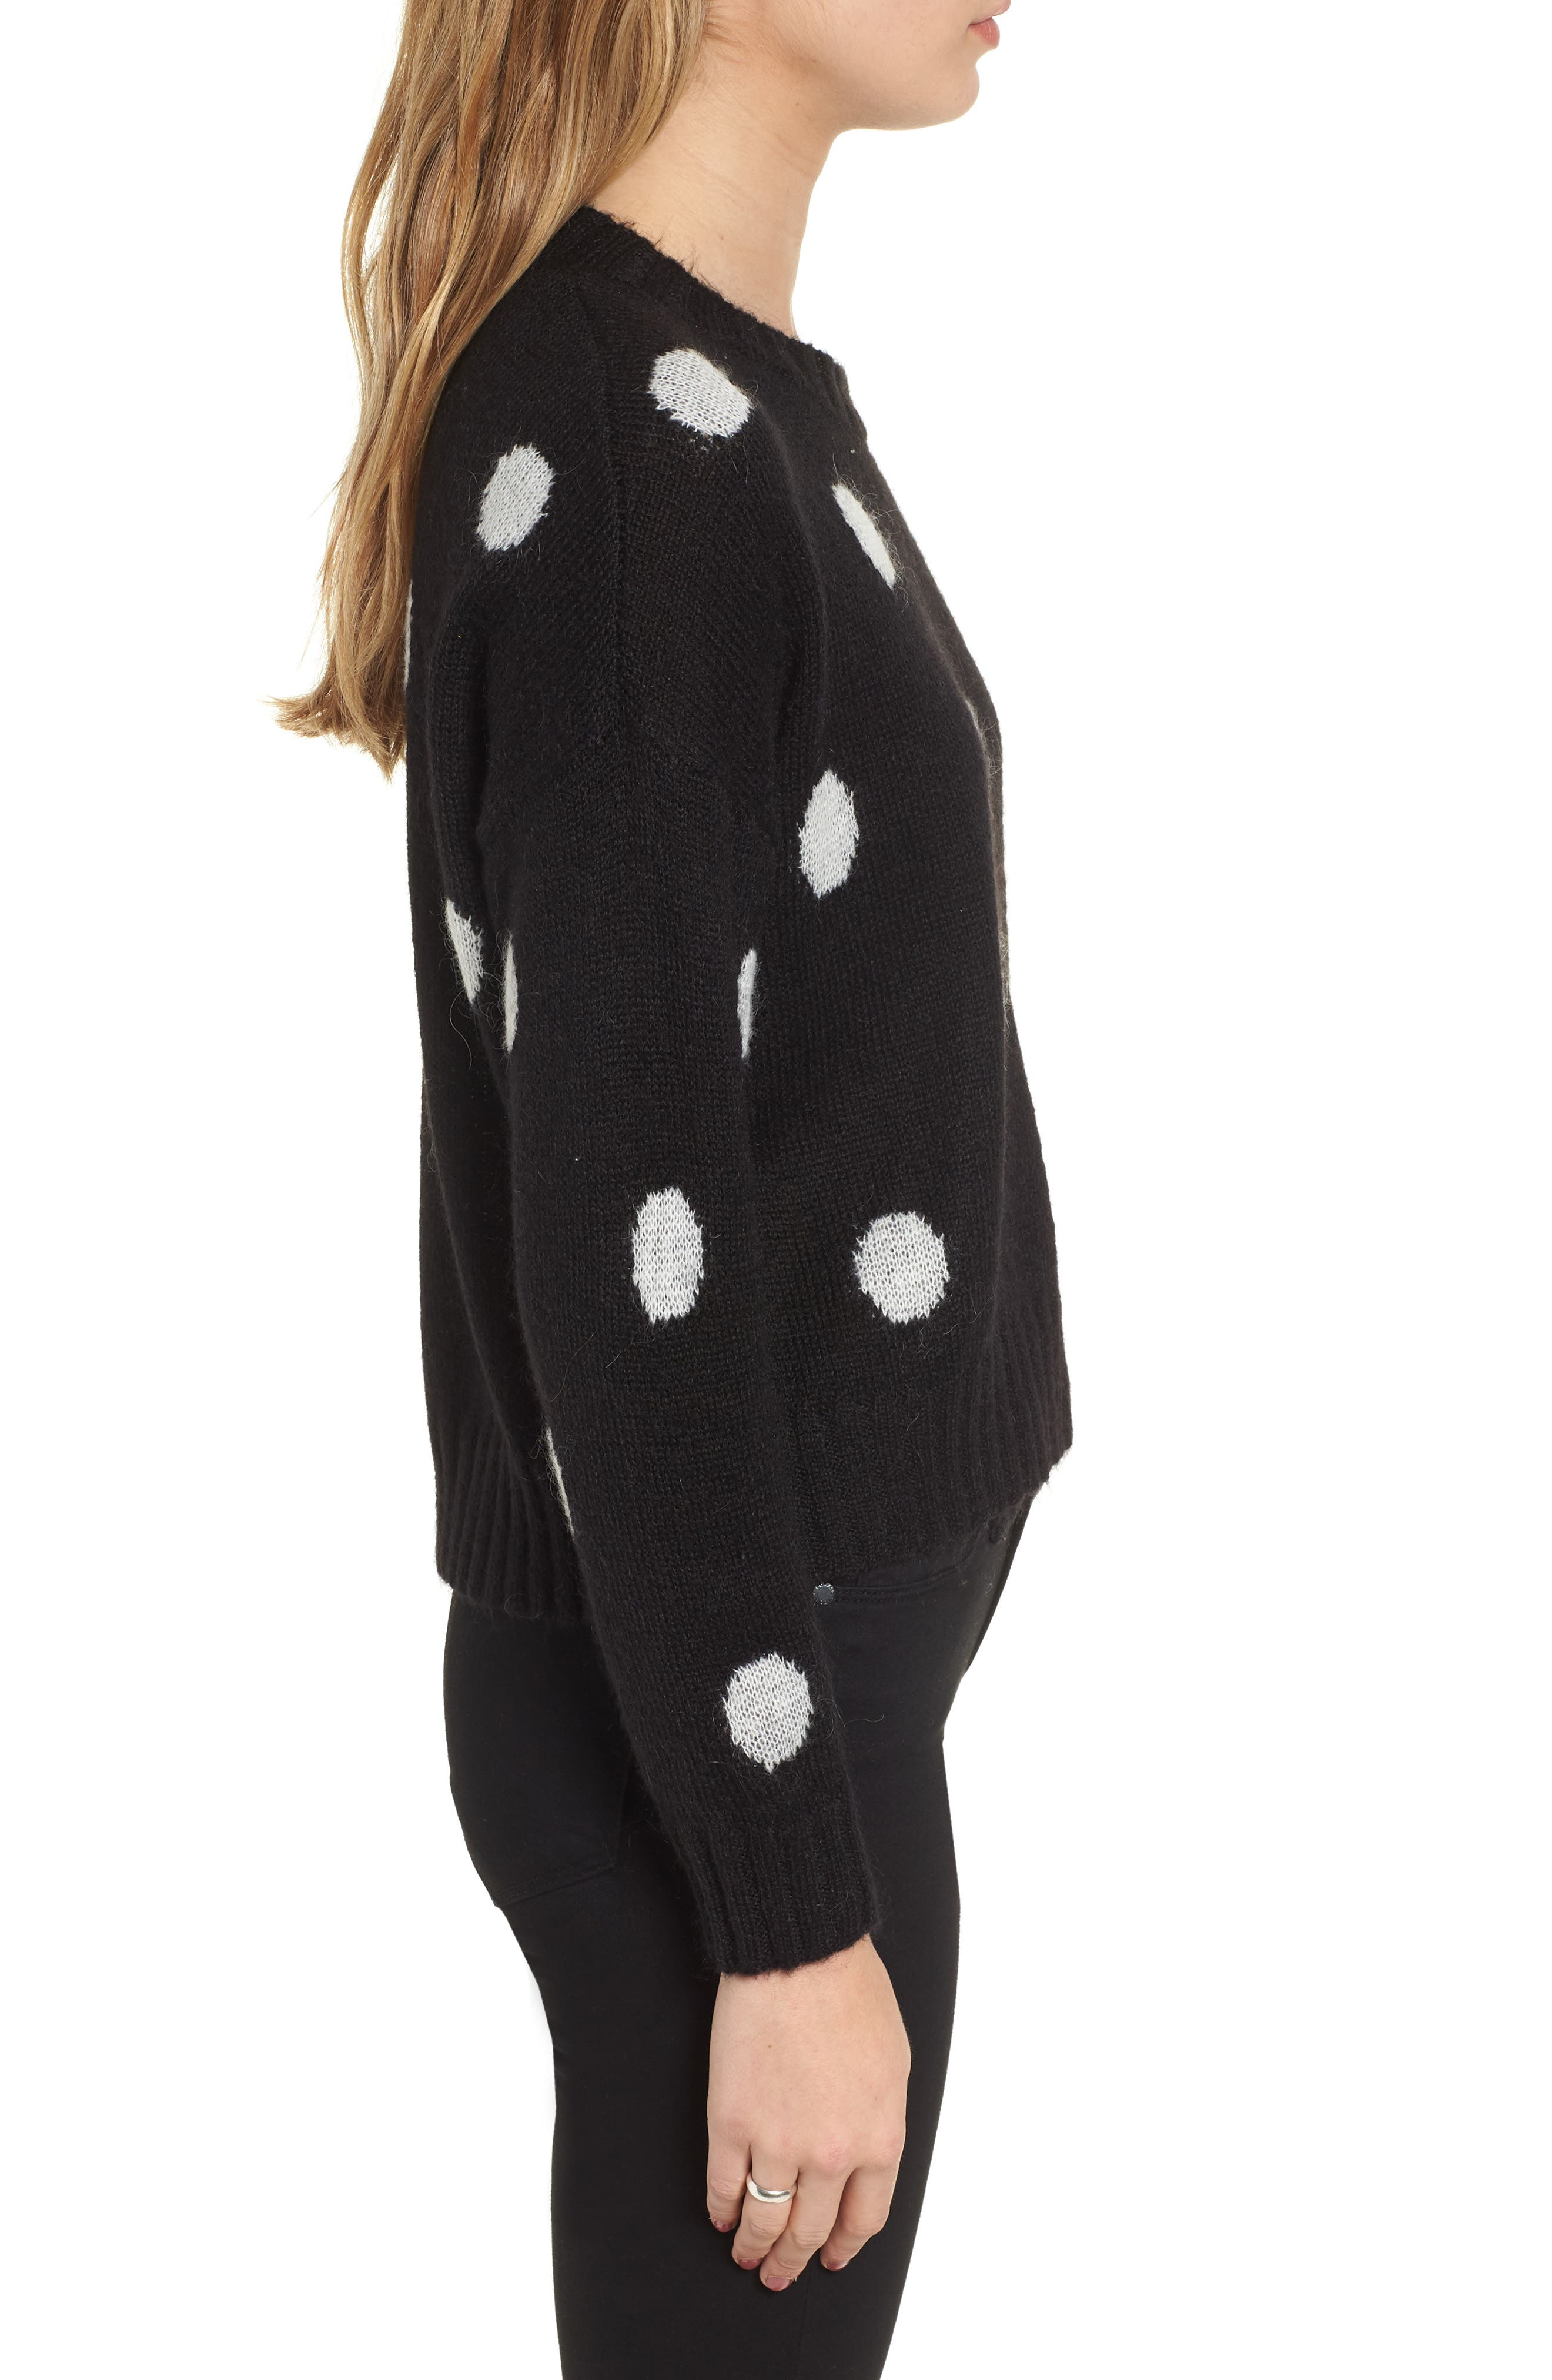 Perci Sweater,                             Alternate thumbnail 3, color,                             BLACK/ IVORY POLKA DOT